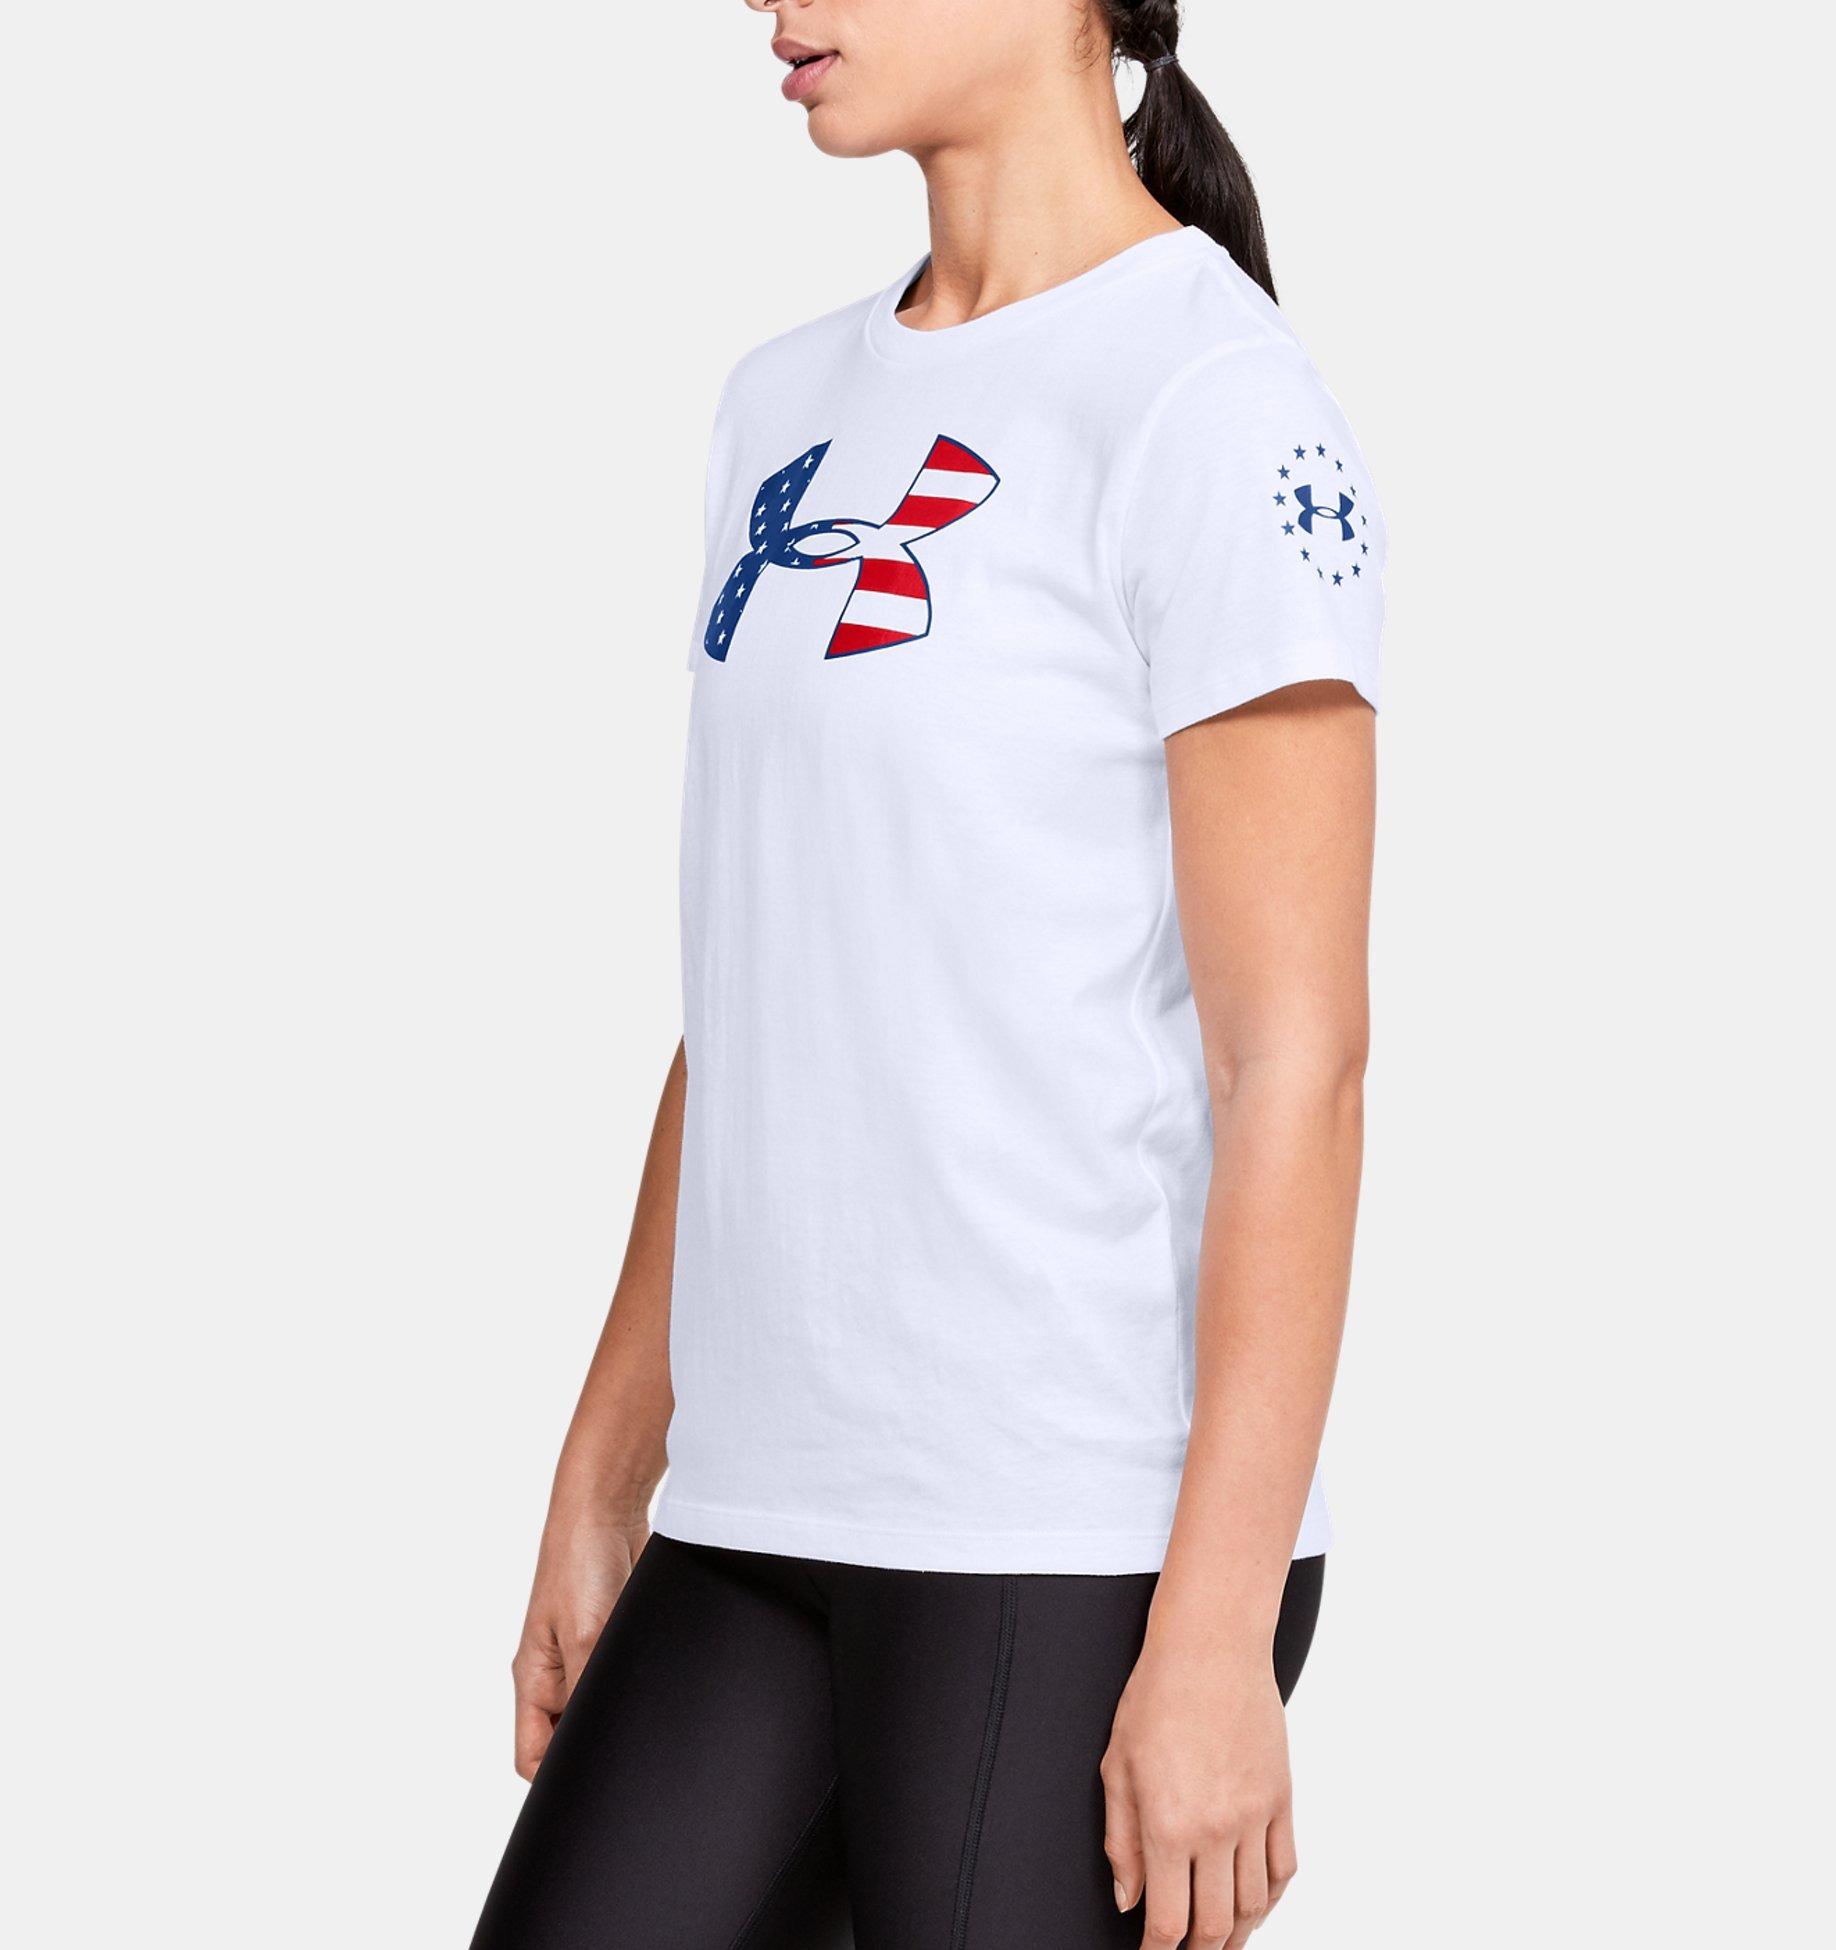 Women's Under Armour Freedom Stars & Stripes T-Shirt (White / Royal) $10.99 + Free S/H